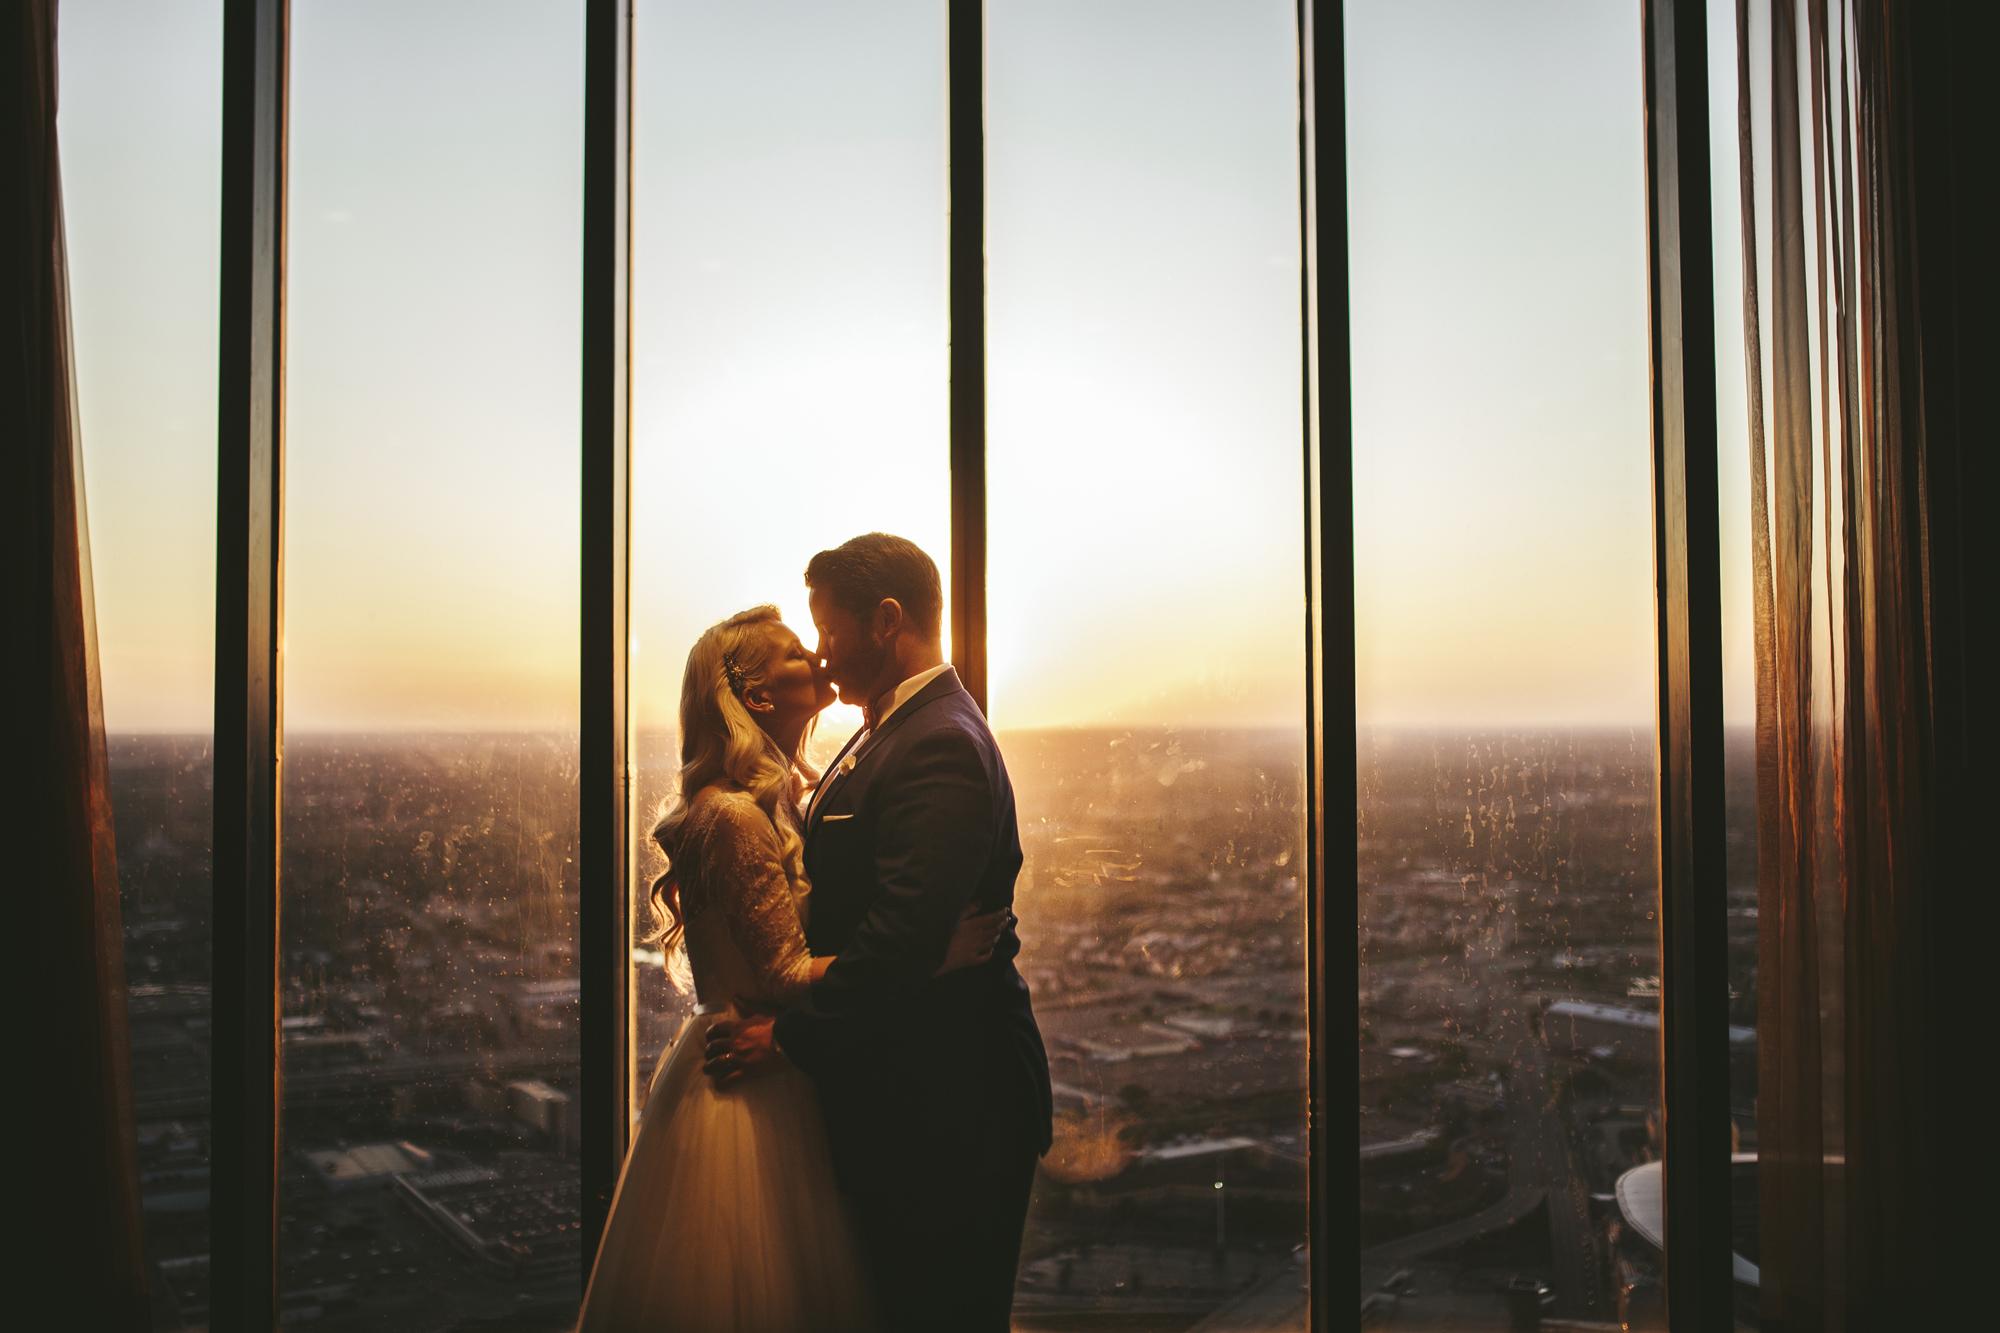 Brandon werth minnesota wedding photographer minneapolis urban windows